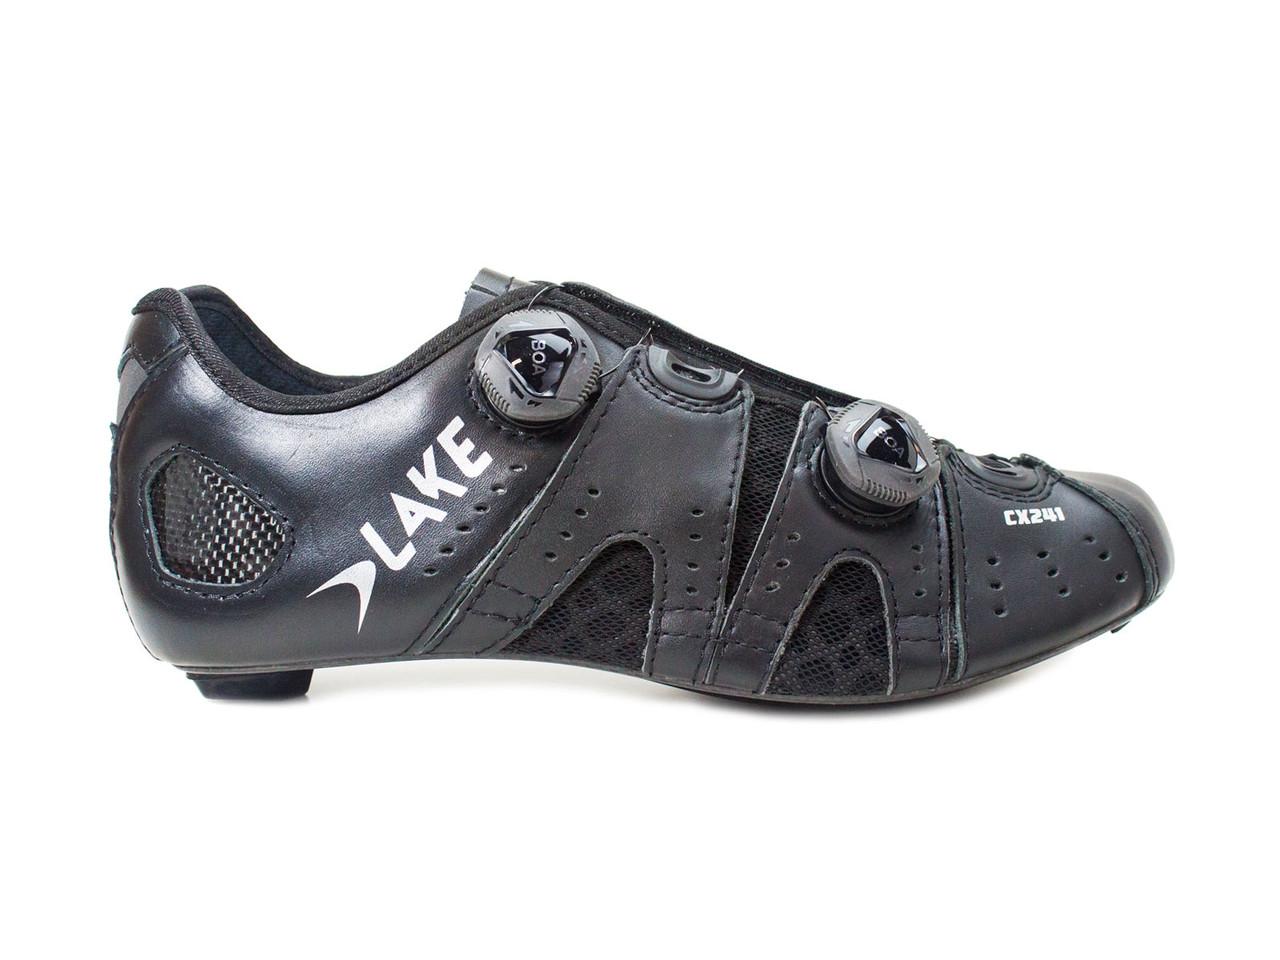 Lake CX241-X Wide Road Bike Shoes